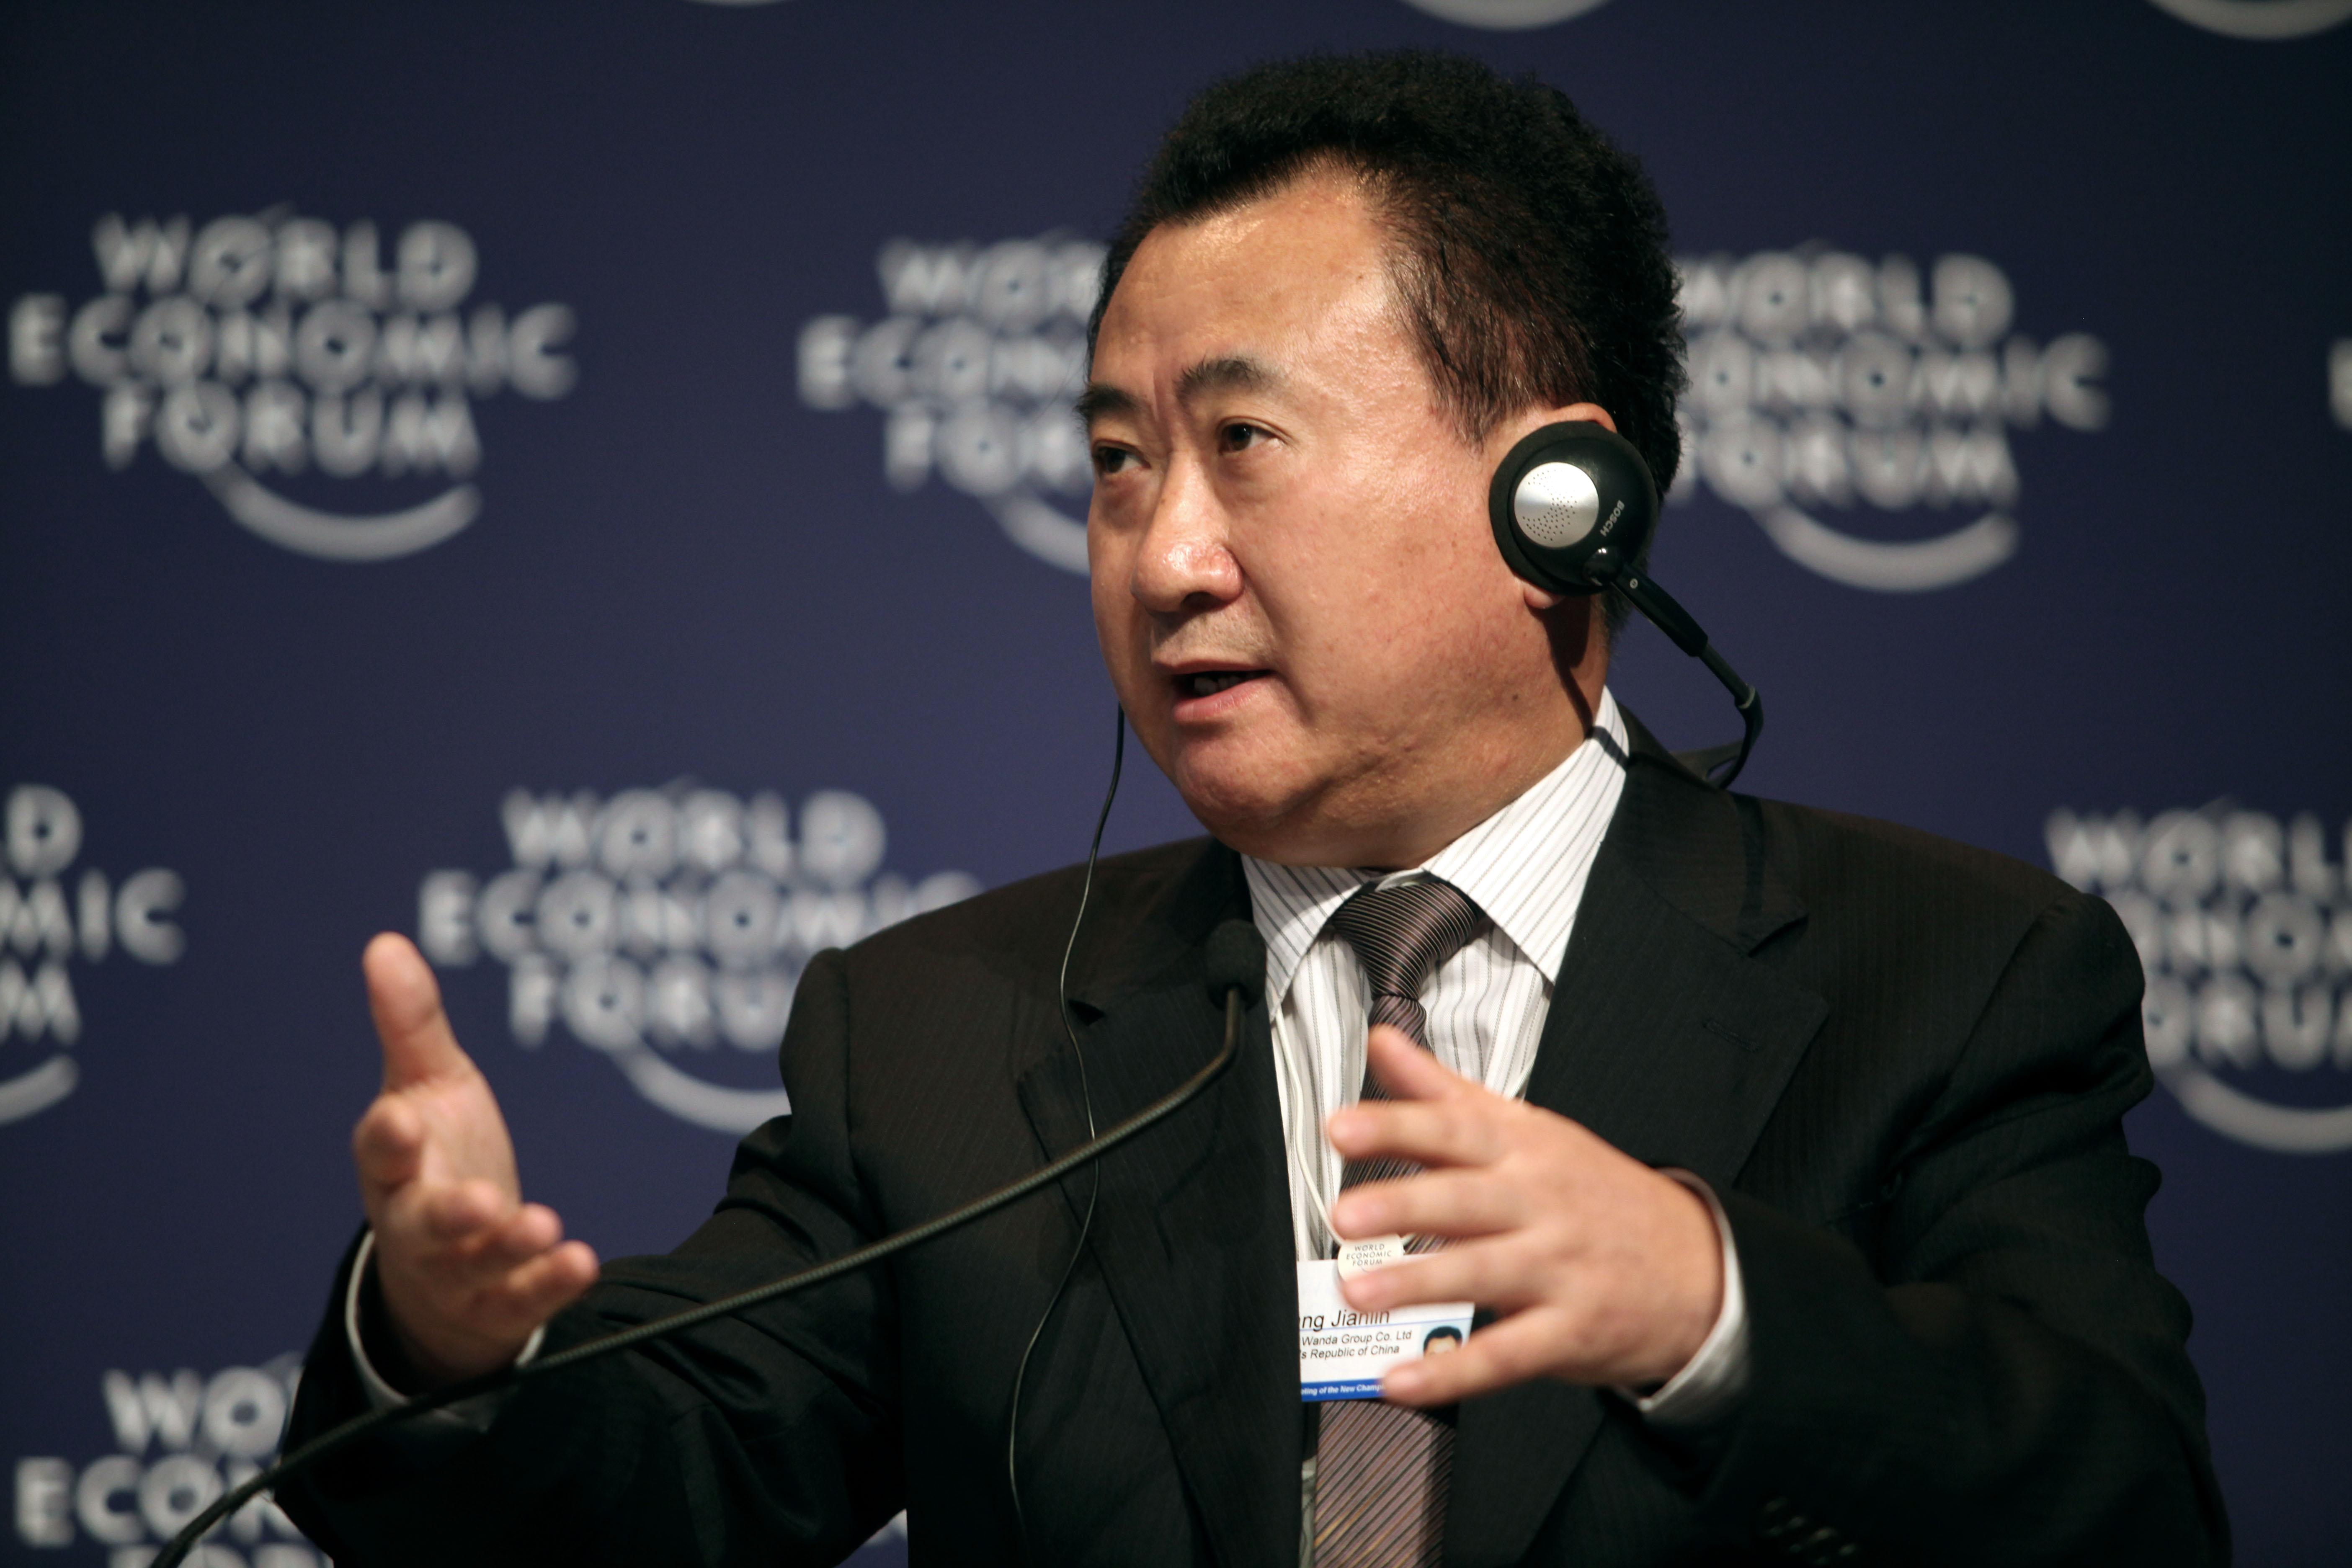 World Economic Forum via flickr